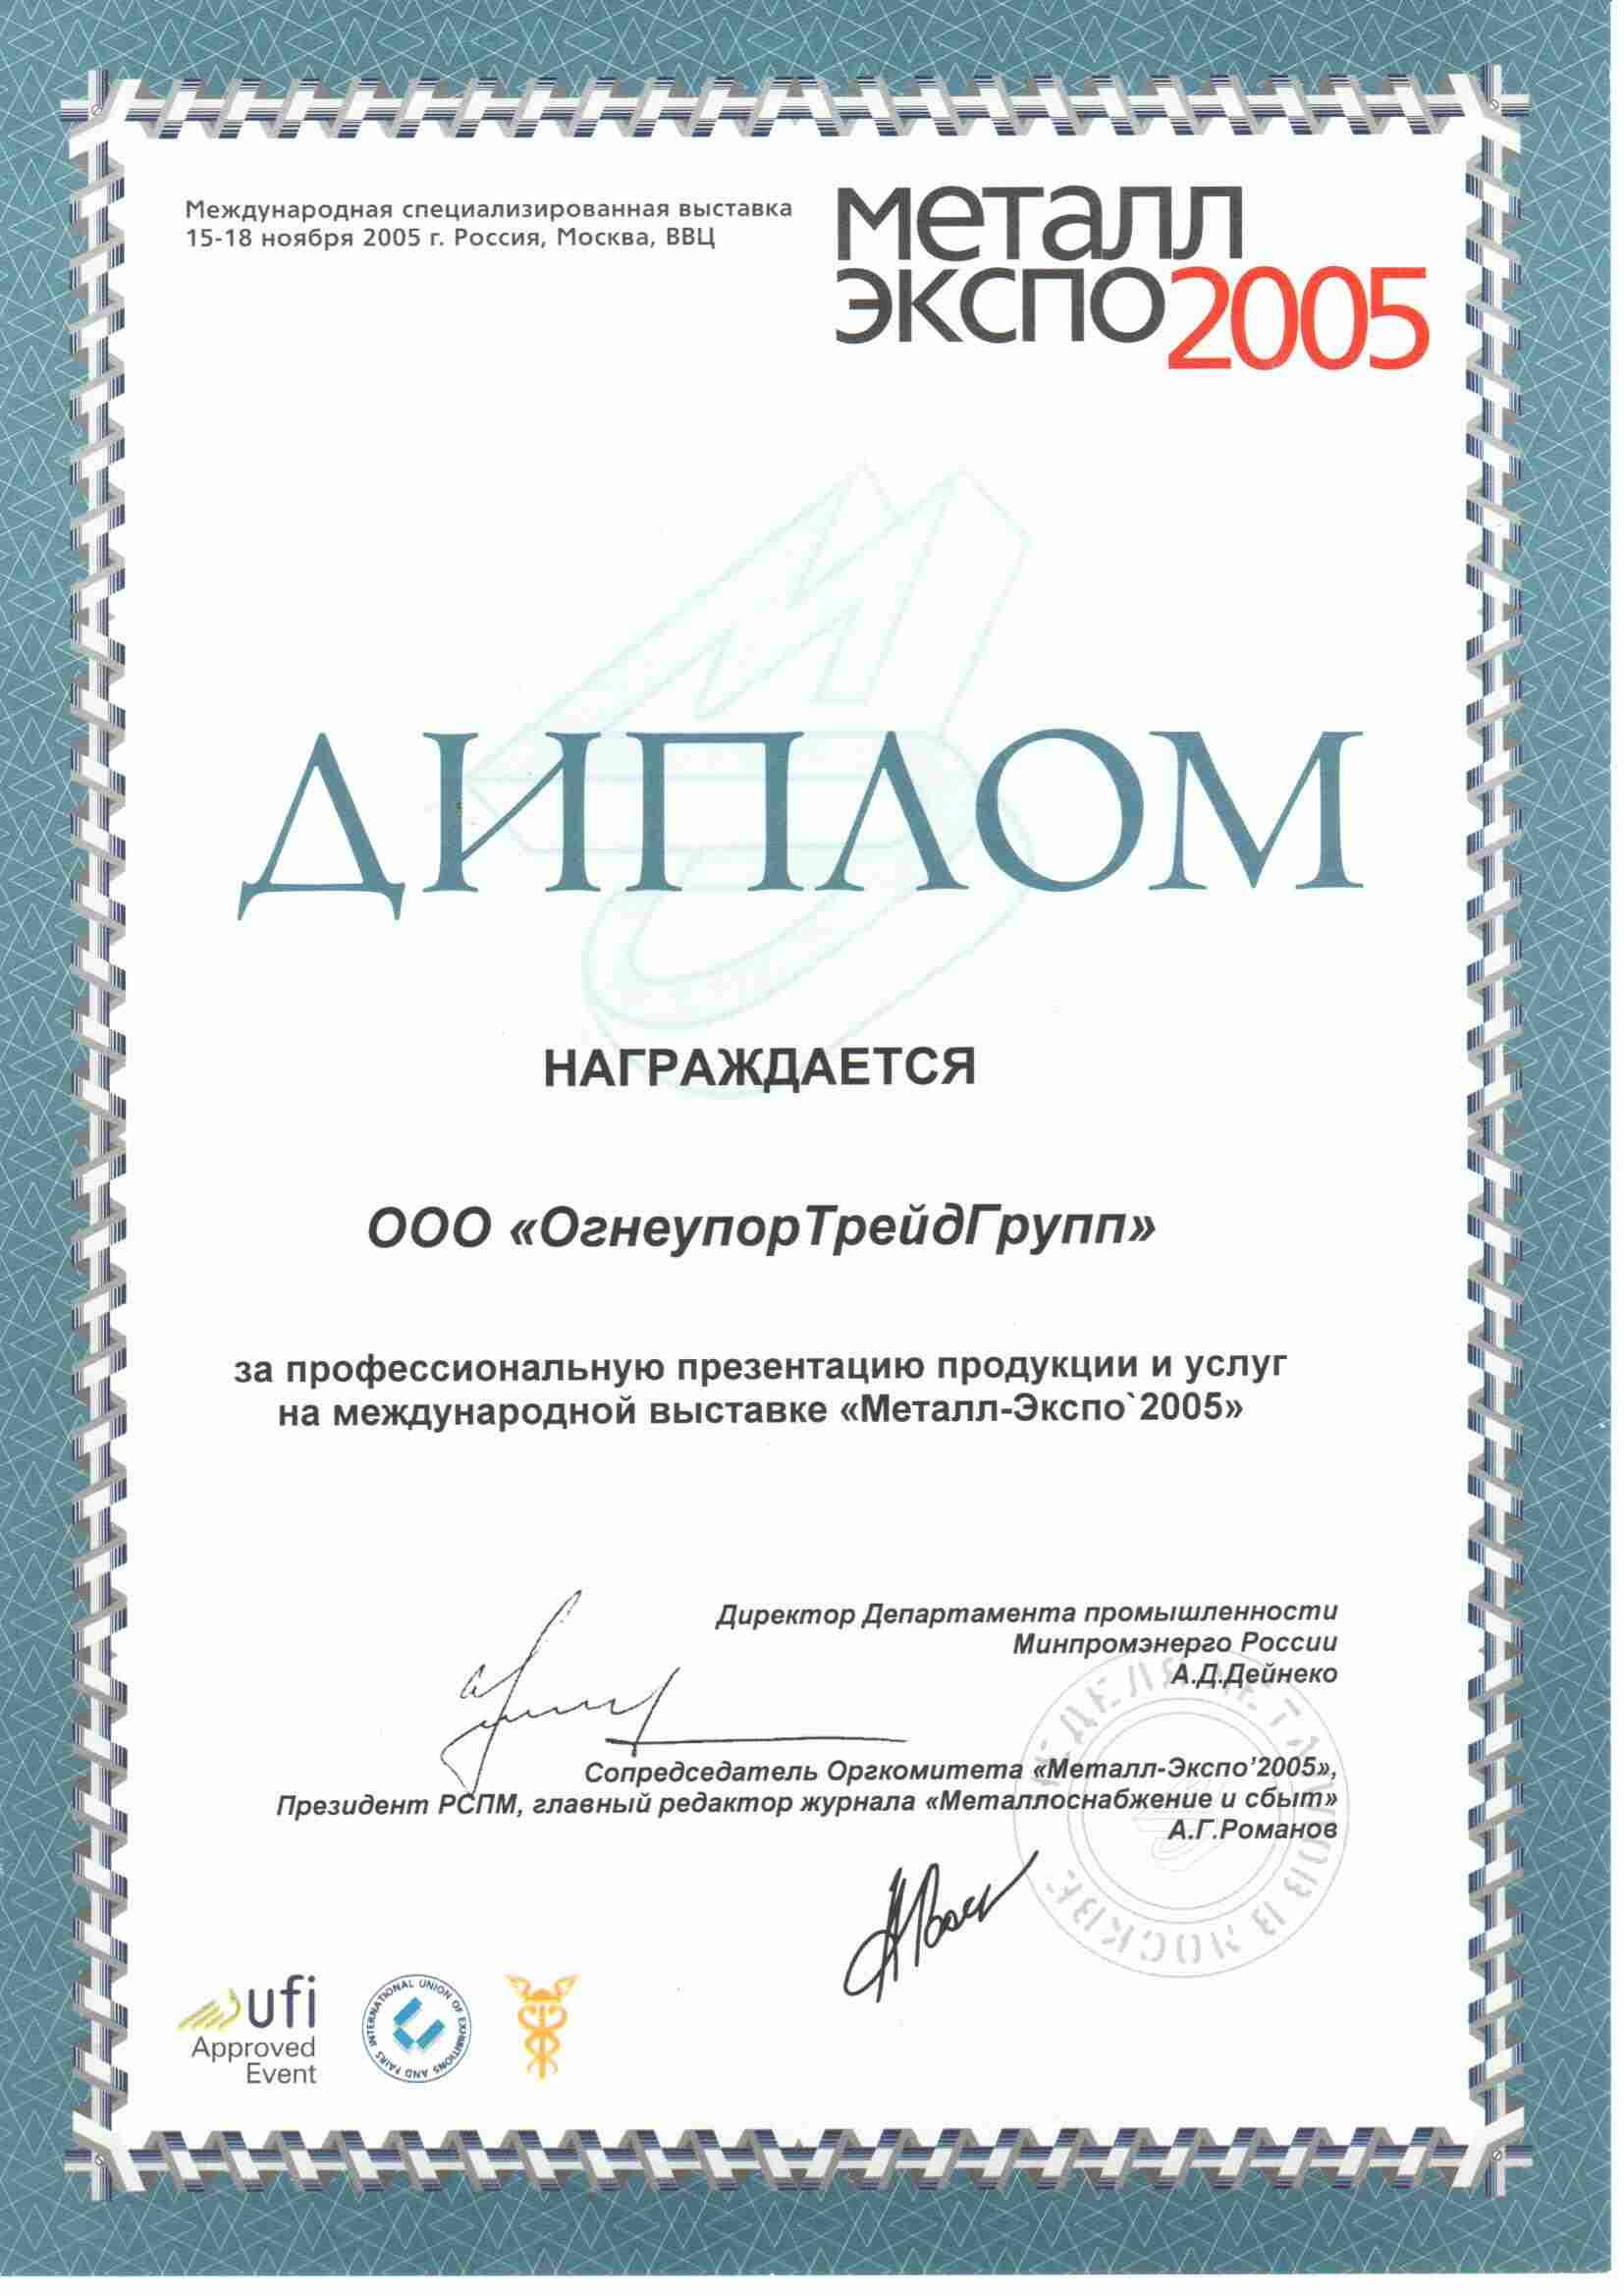 2005_metallexpo